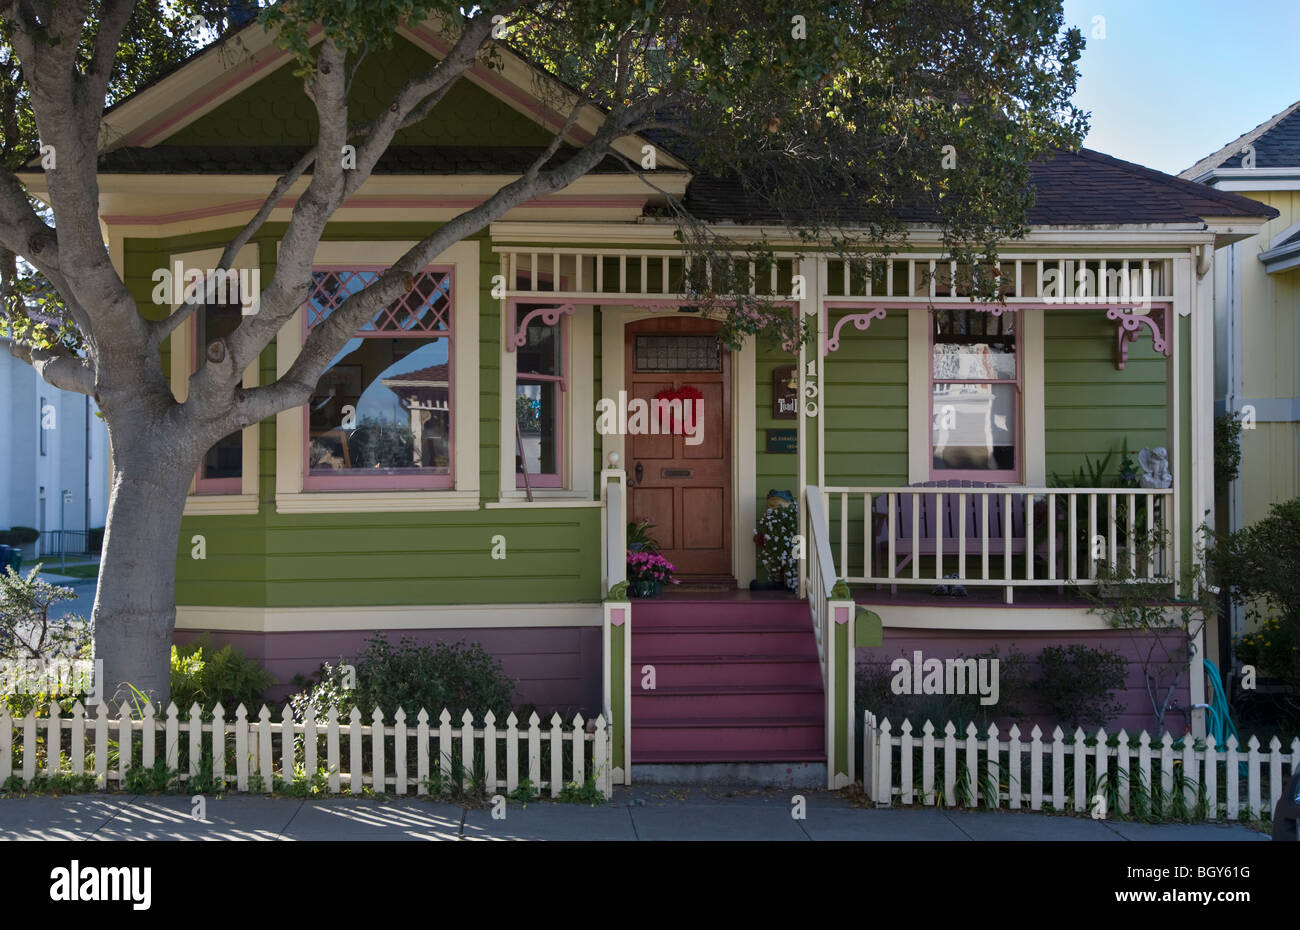 Ms Cornelia Pierce built TOAD HALL in 1904 - PACIFIC GROVE, CALIFORNIA - Stock Image